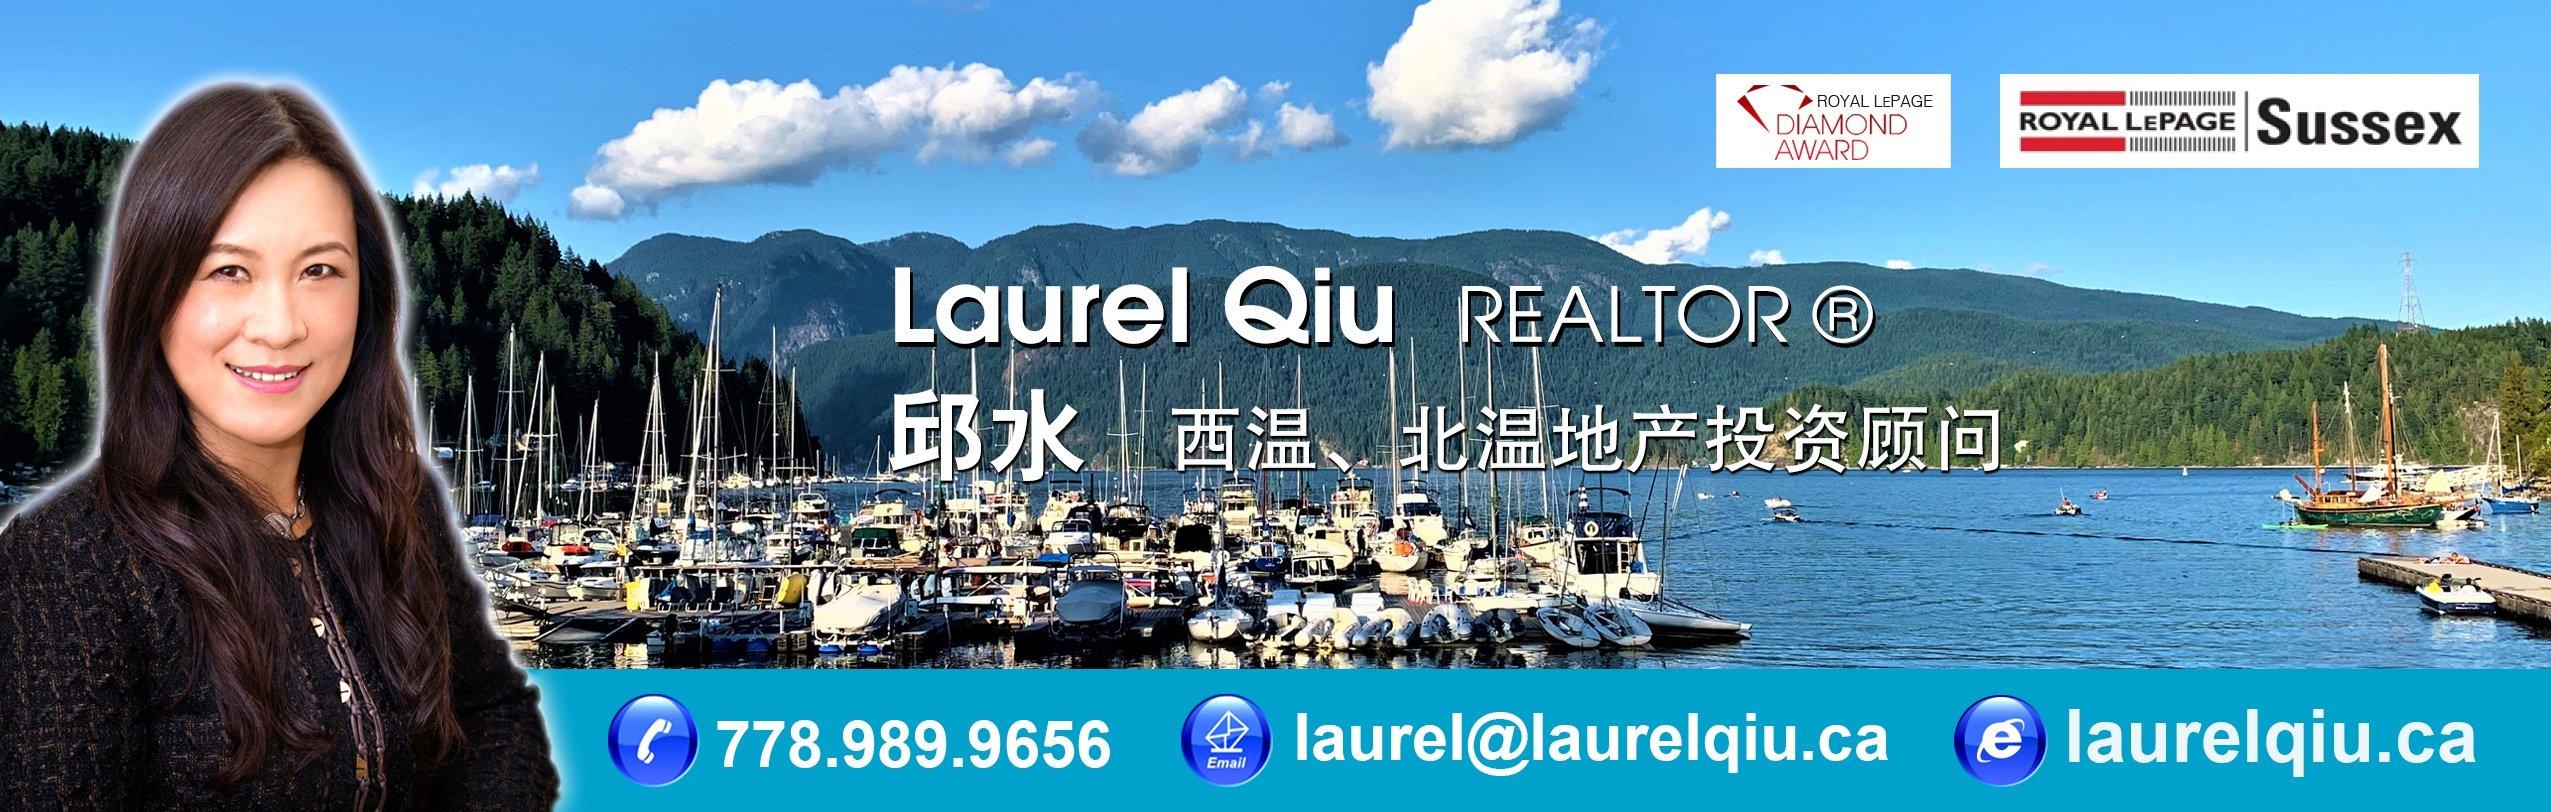 Laurel Qiu